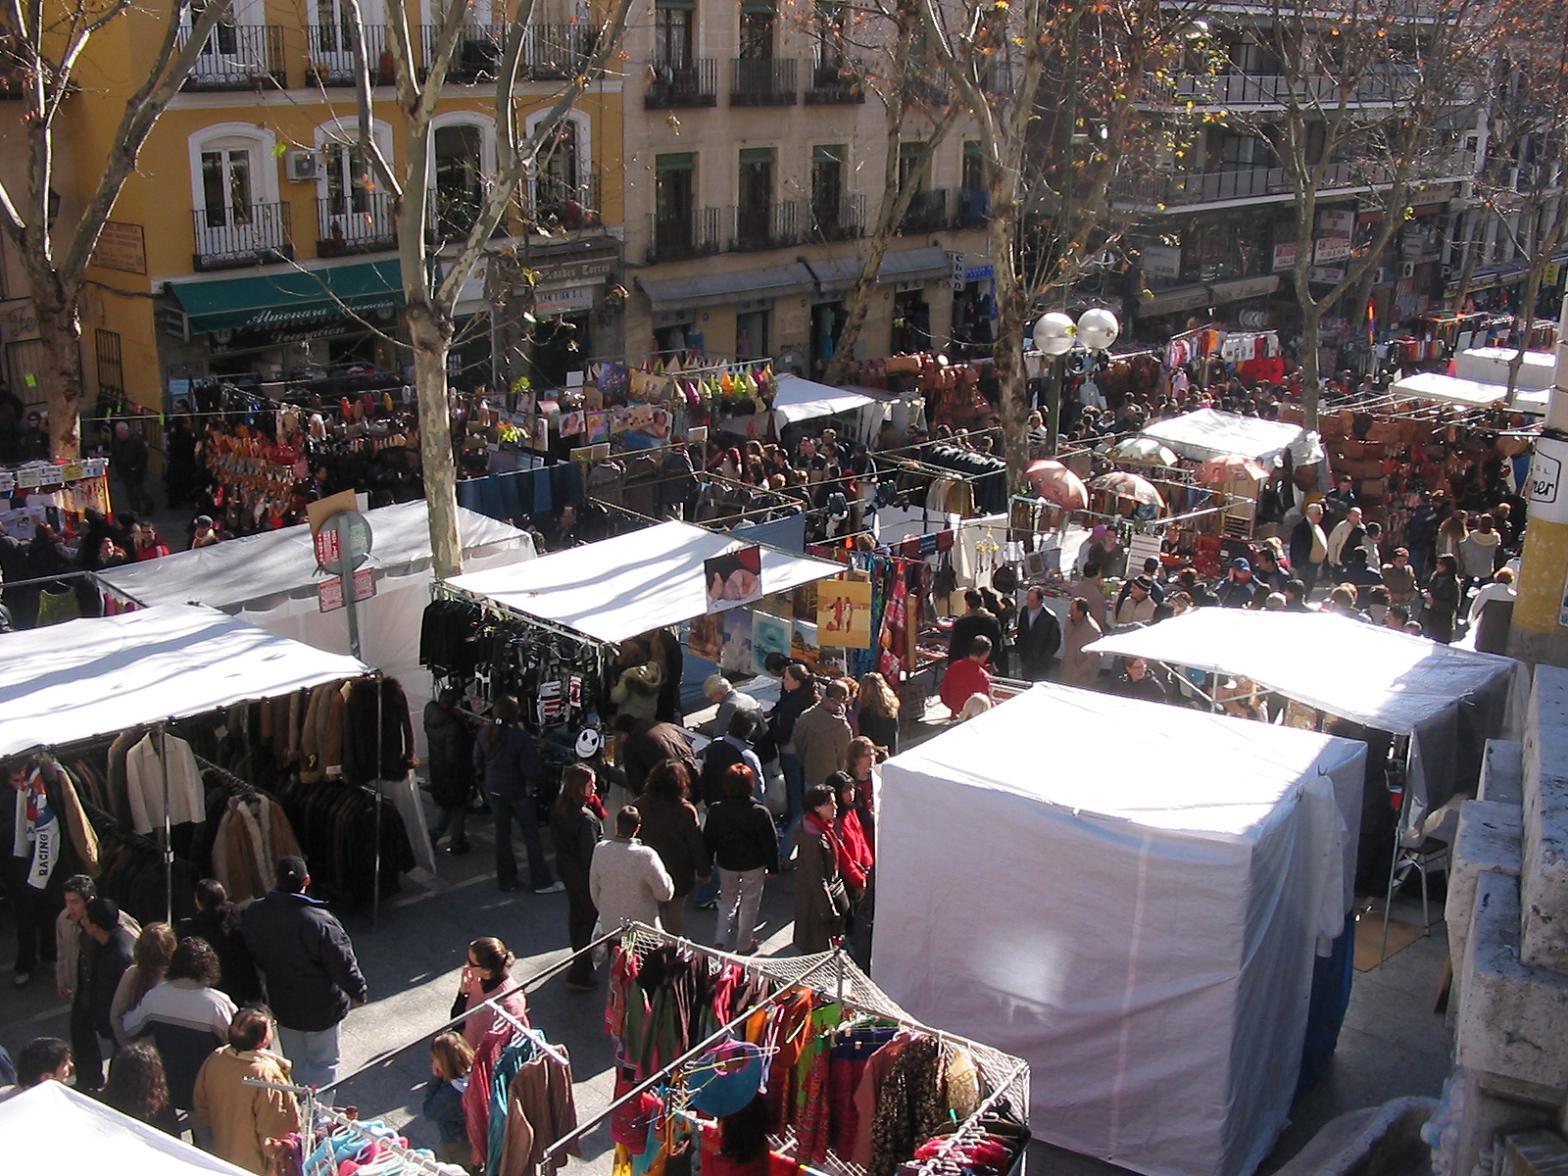 El Rastro: The Most Popular Sunday Flea Market in Madrid